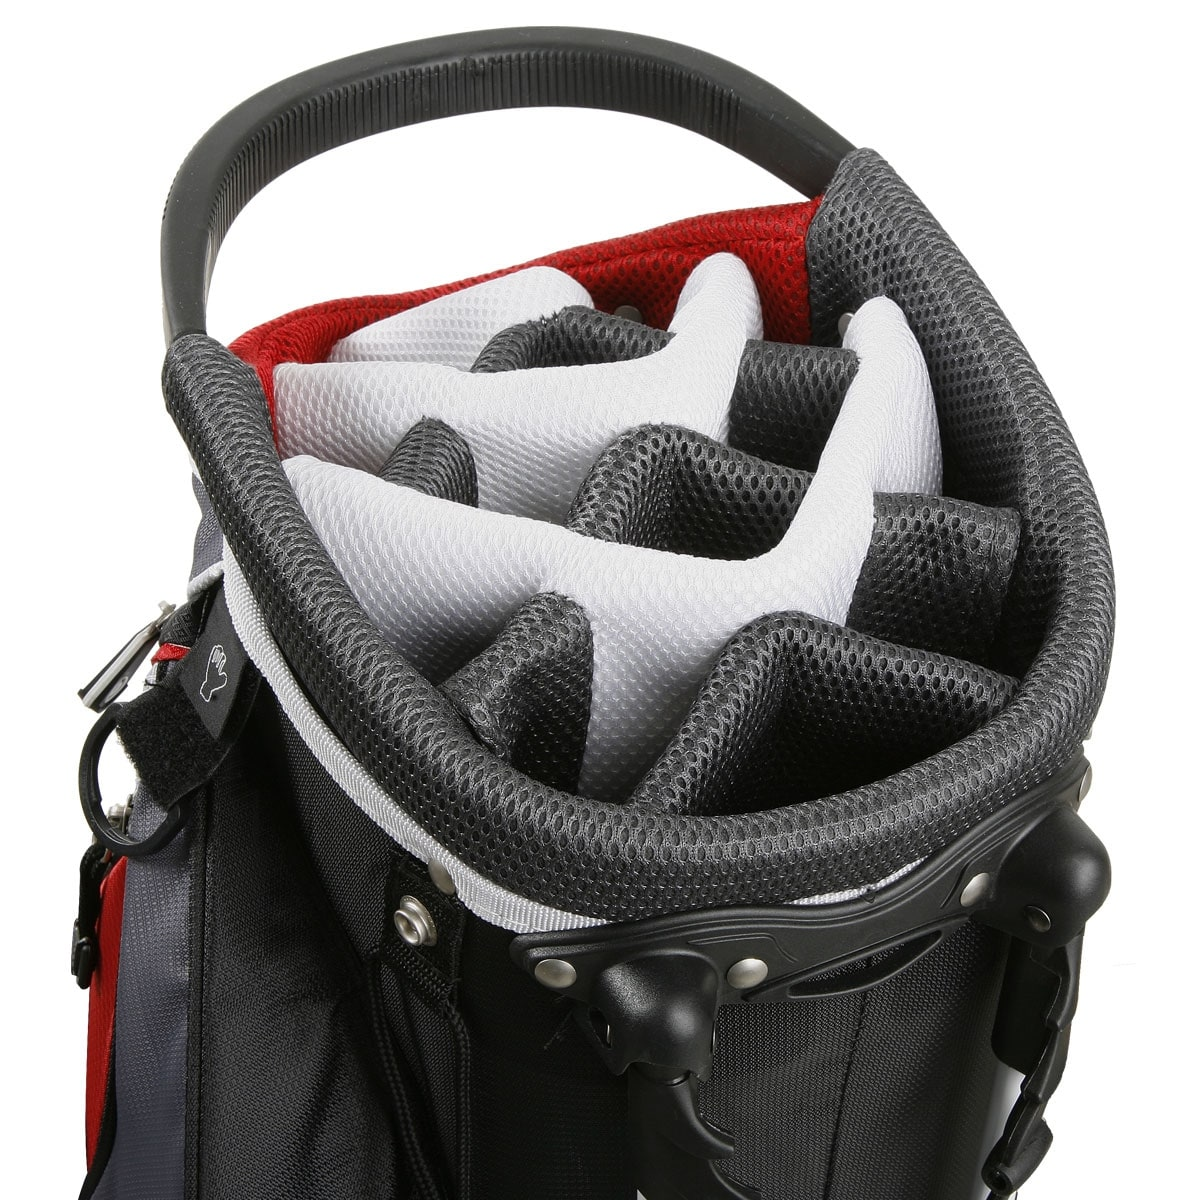 Bilt Tps Dunes 14 Way Black Blue Stand Golf Bag Free Shipping Today 24636618